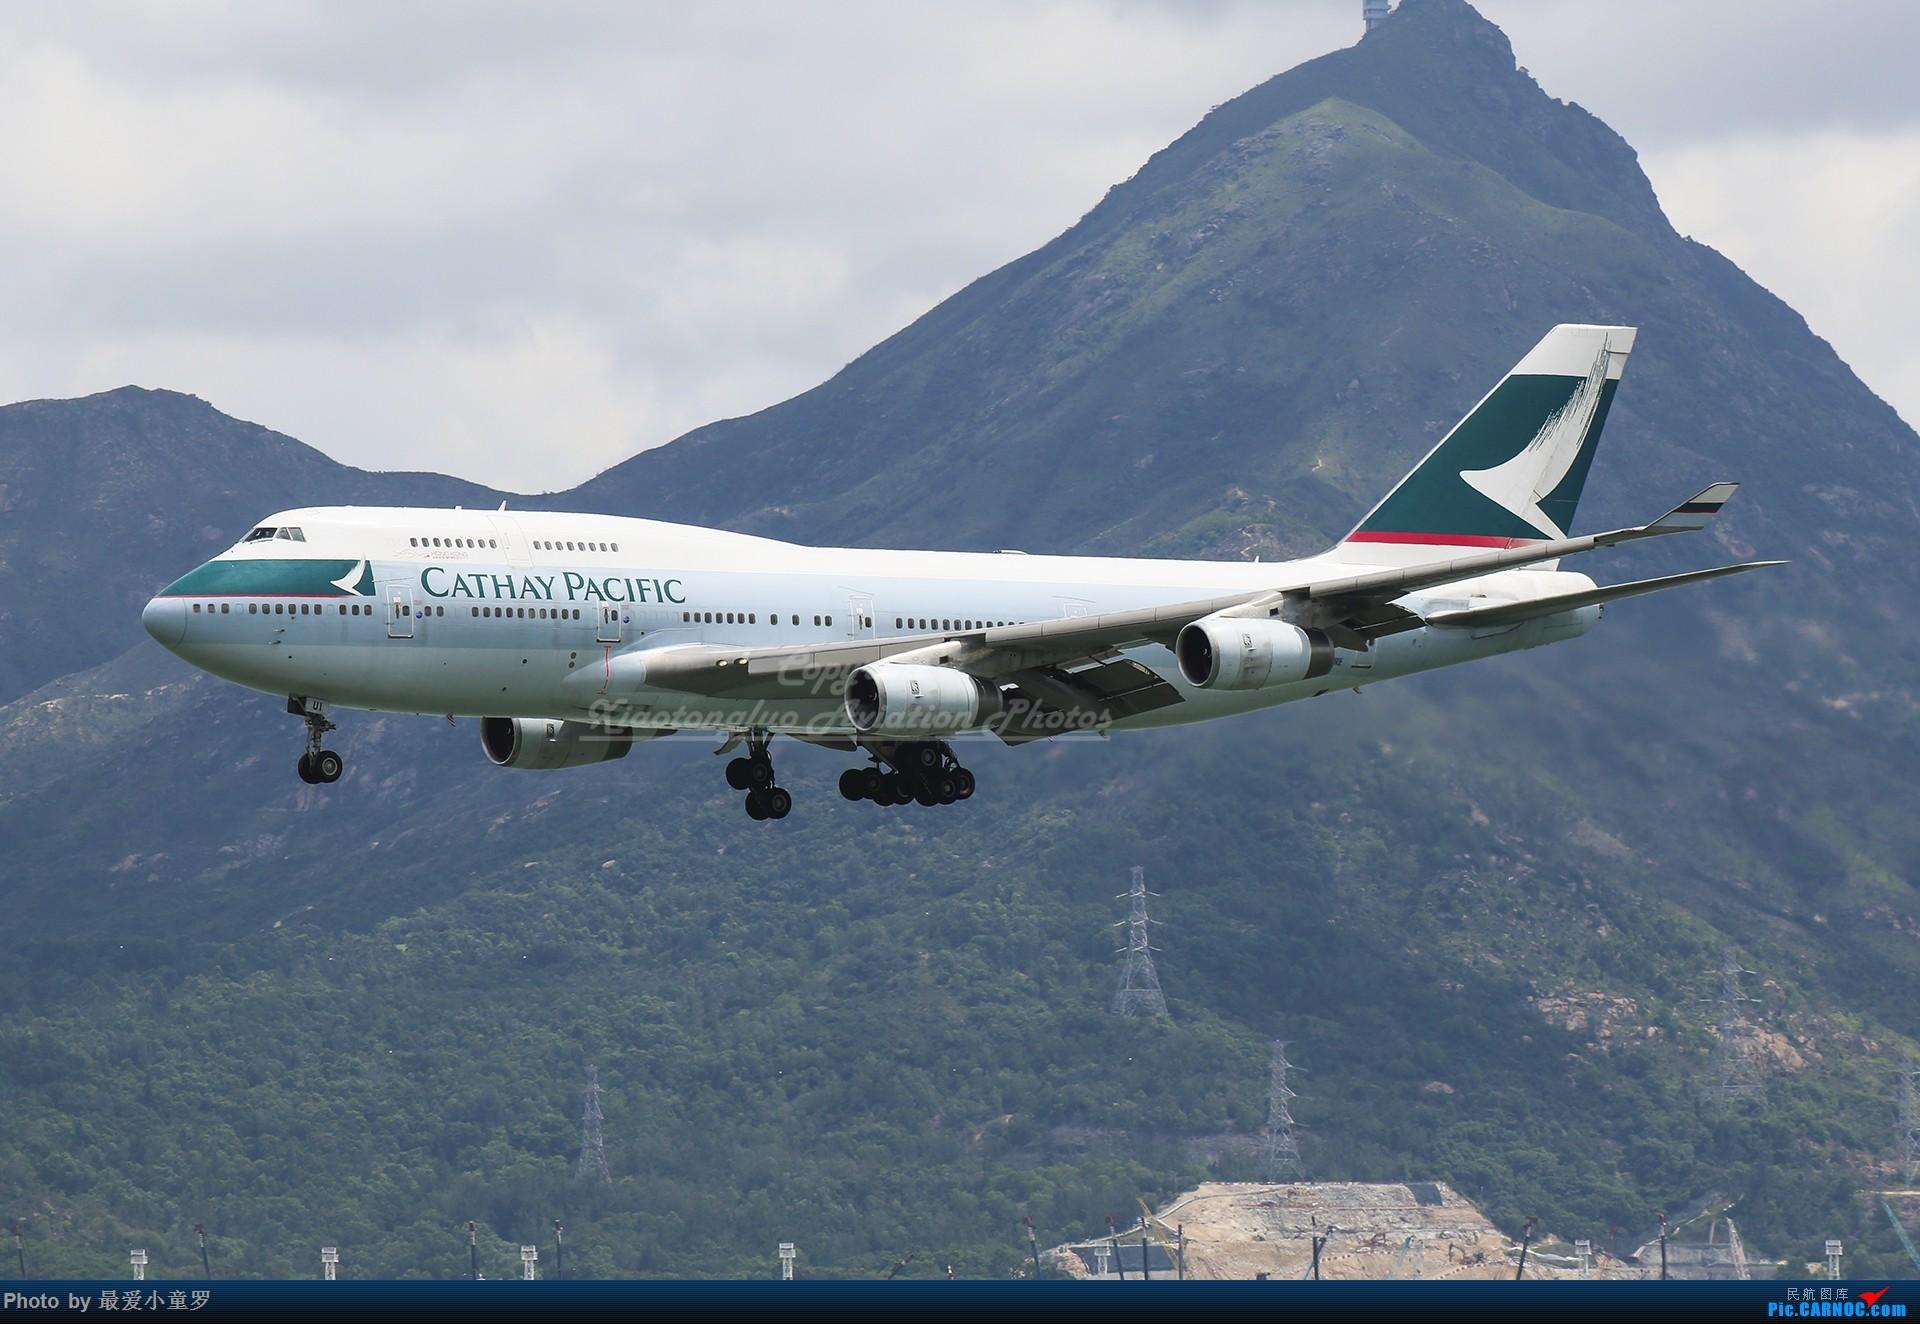 Re:[原创]2013-2018,系列组图纪念拍机5周年 BOEING 747-400 B-HUI 中国香港国际机场